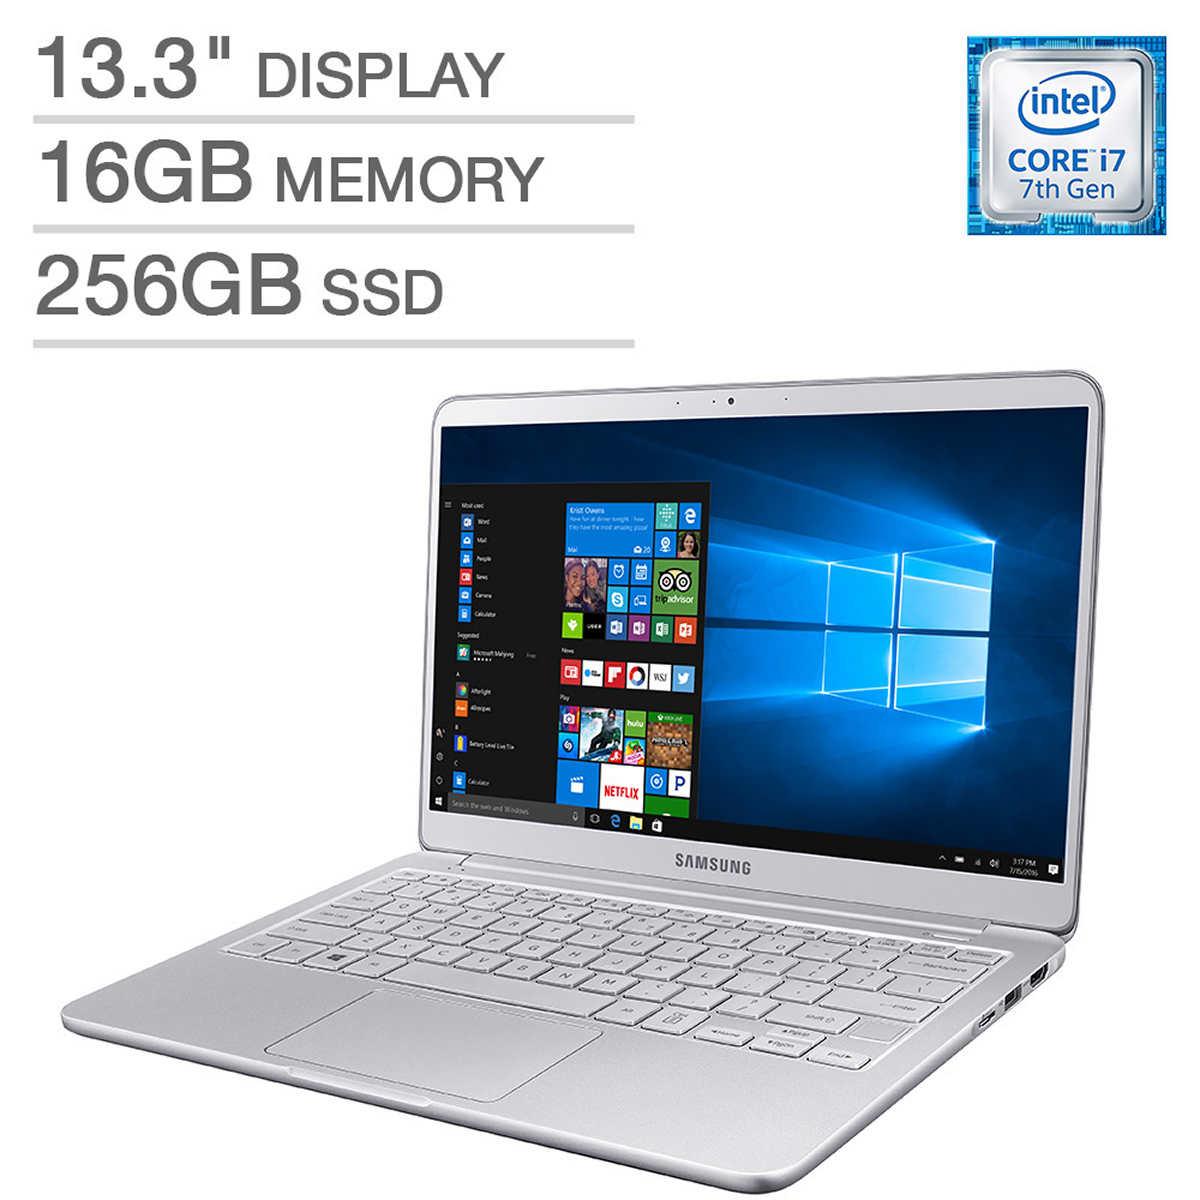 Laptop samsung 300e precio mexico - Samsung Notebook 9 13 3 Laptop Intel Core I7 1080p